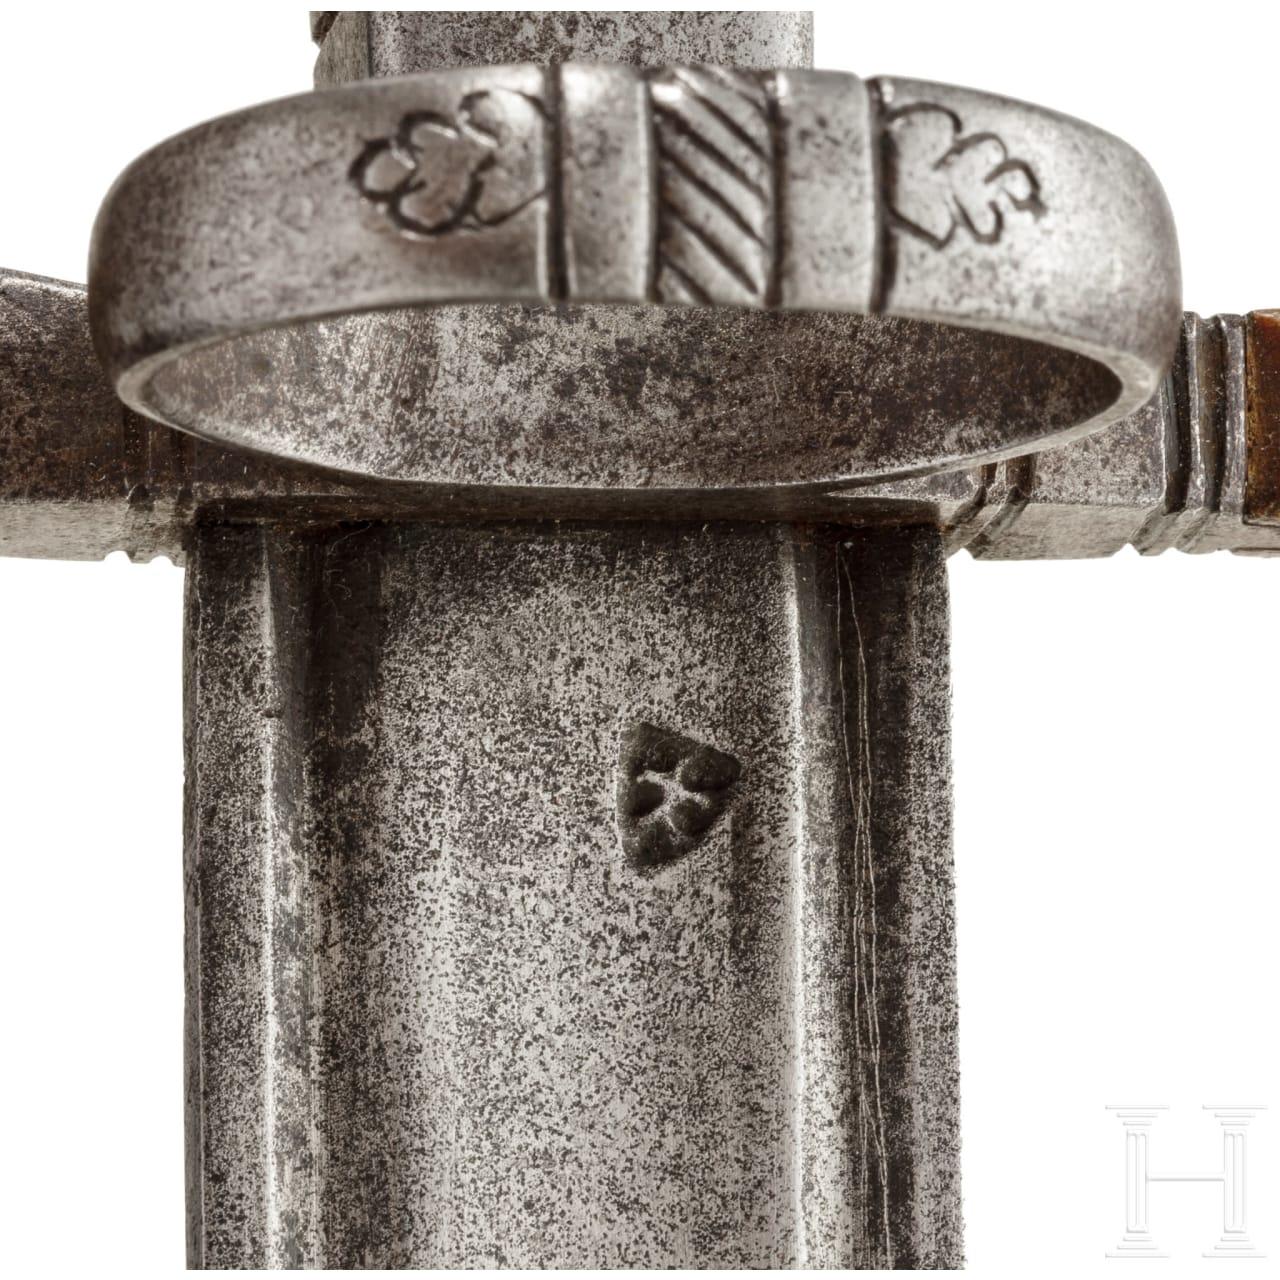 A German hunting sword, circa 1700